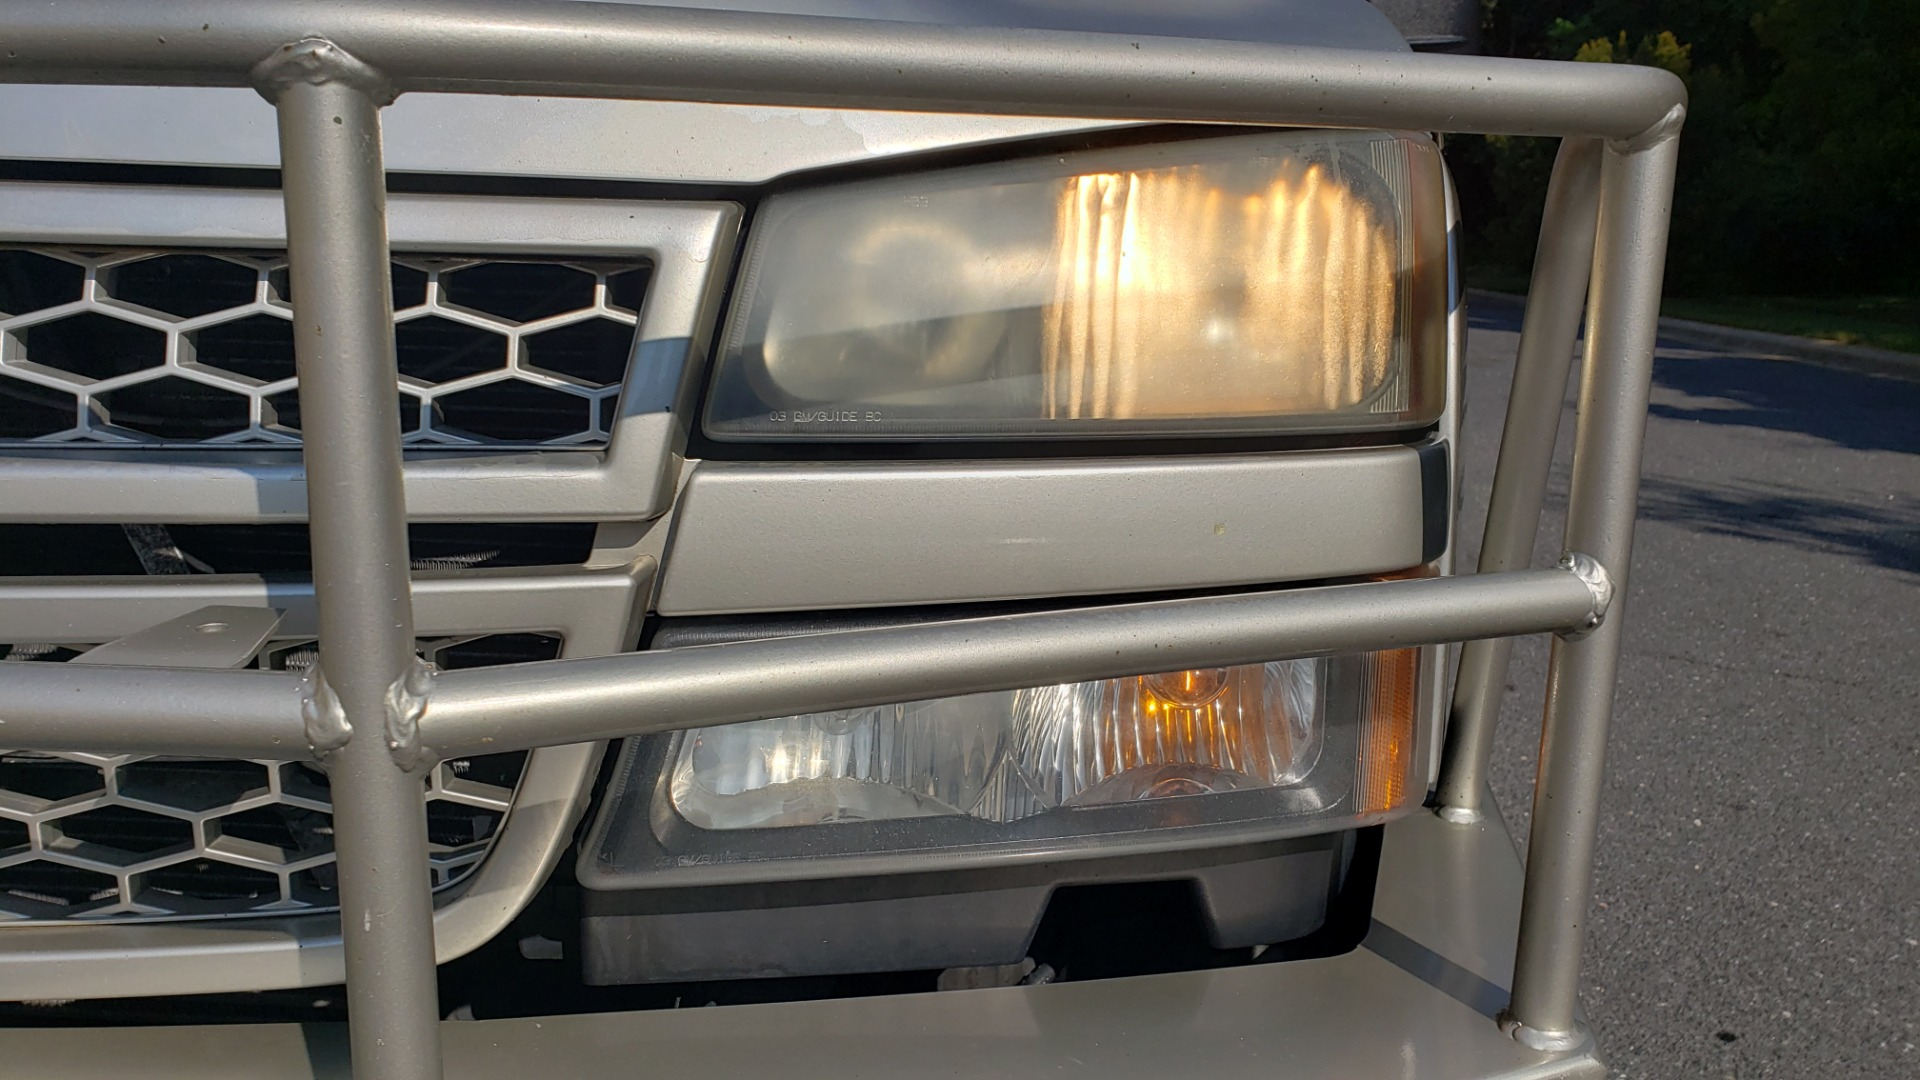 Used 2005 Chevrolet SILVERADO 3500 DRW / 4WD / REG CAB / 6.6L DURAMAX / DOOMSDAY PREPPER for sale $21,499 at Formula Imports in Charlotte NC 28227 32